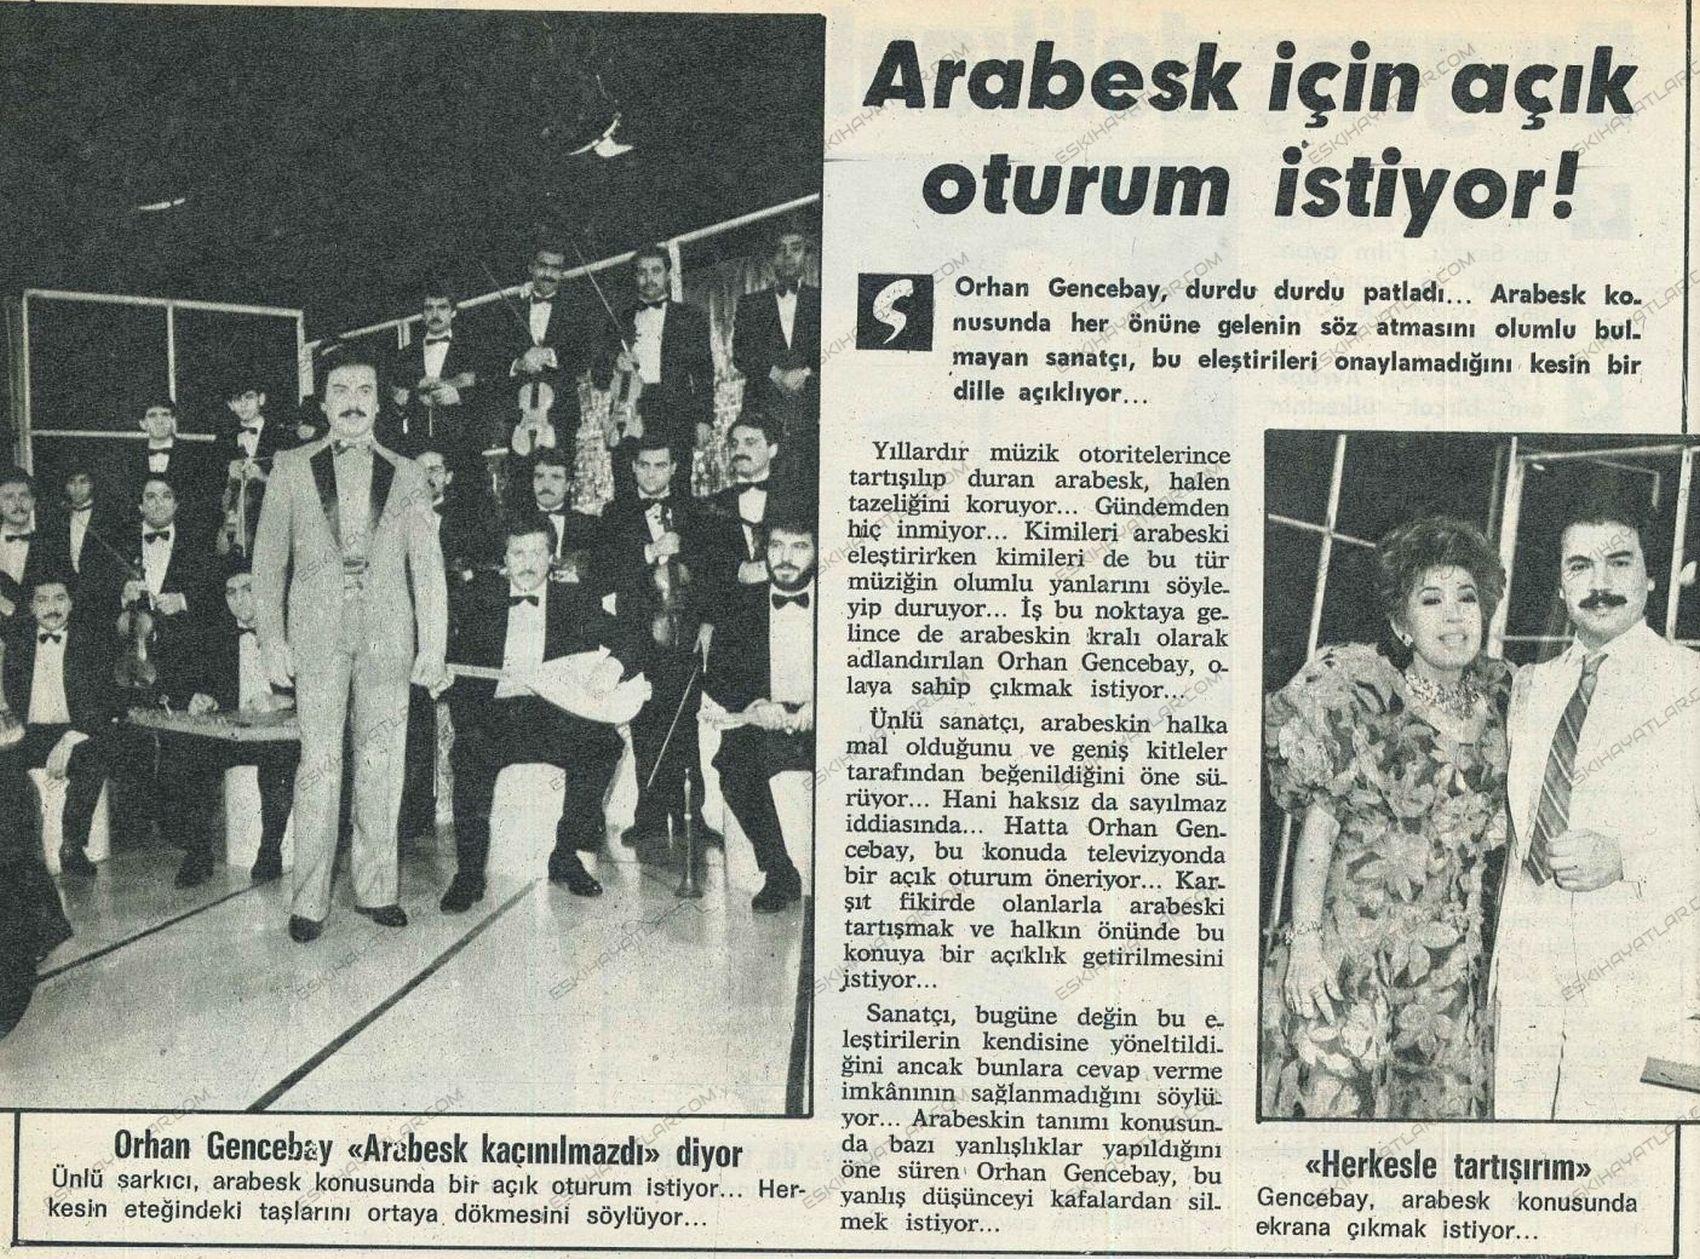 0346-orhan-gencebay-1989-arabesk-yasaklari-ses-dergisi